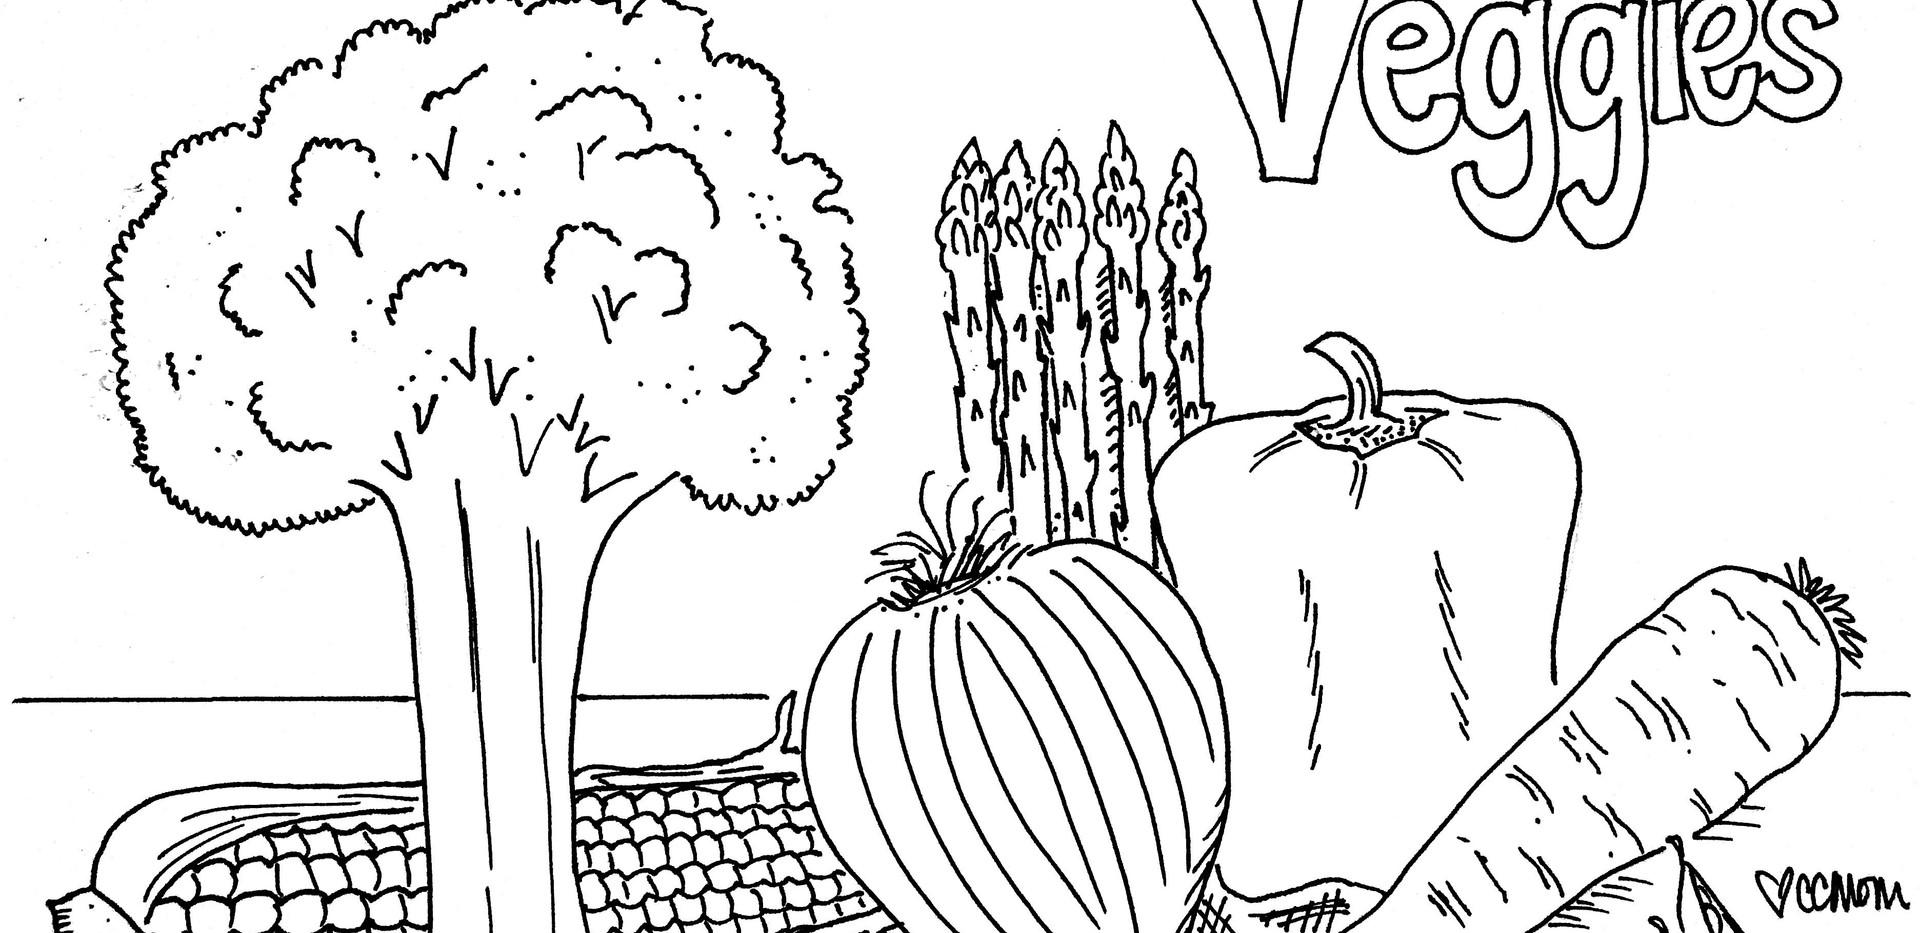 Eat Your Veggies_1.jpg